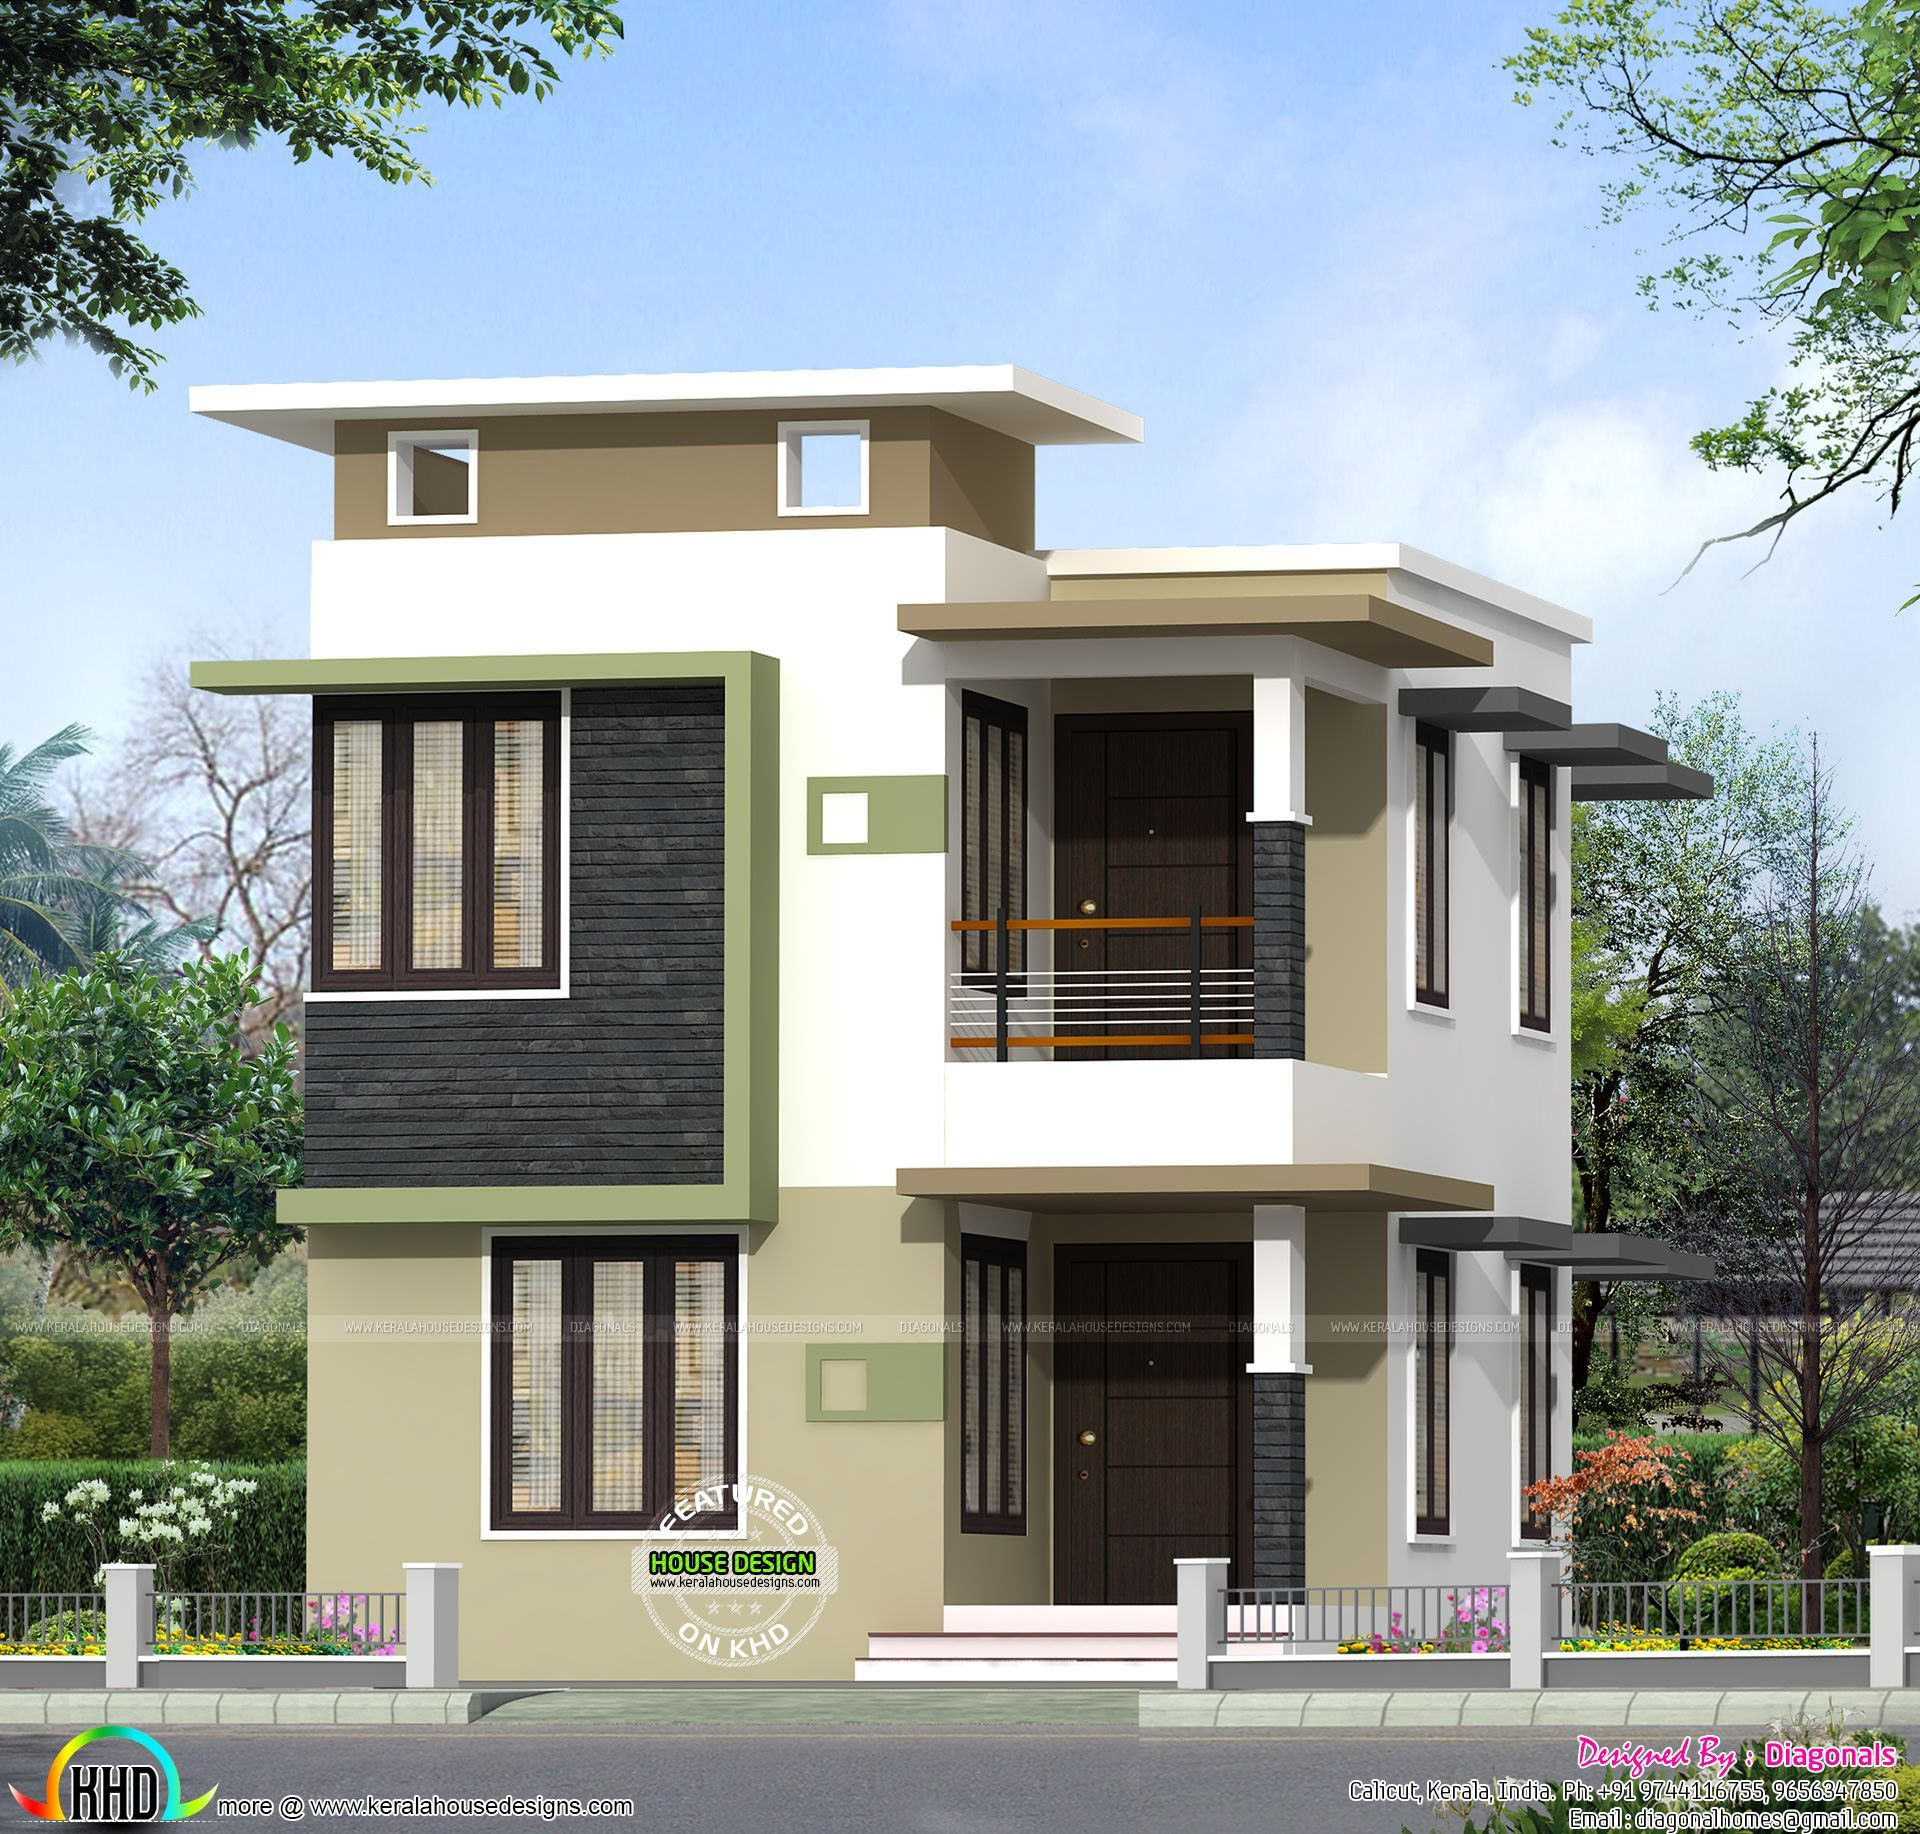 1631 Sq Ft House Plan Jpg 1920 1834 Falseceilingideassimple Small House Design House Elevation Duplex House Design